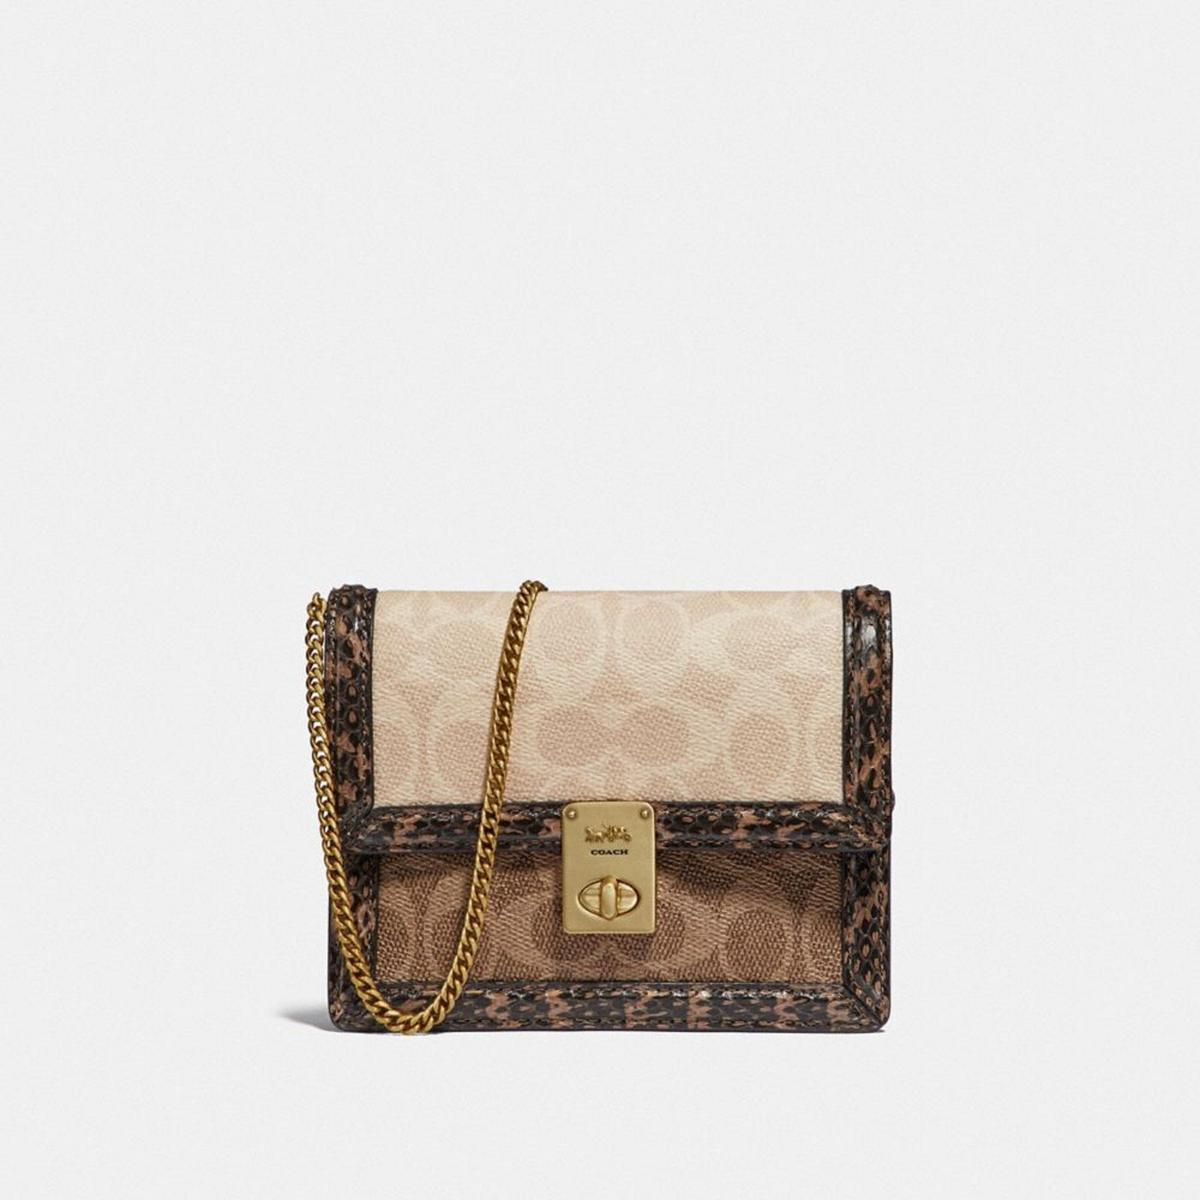 Signature塗層帆布印花拼接蛇皮細節的皮革Hutton手袋。NT$16,800(COACH提供)